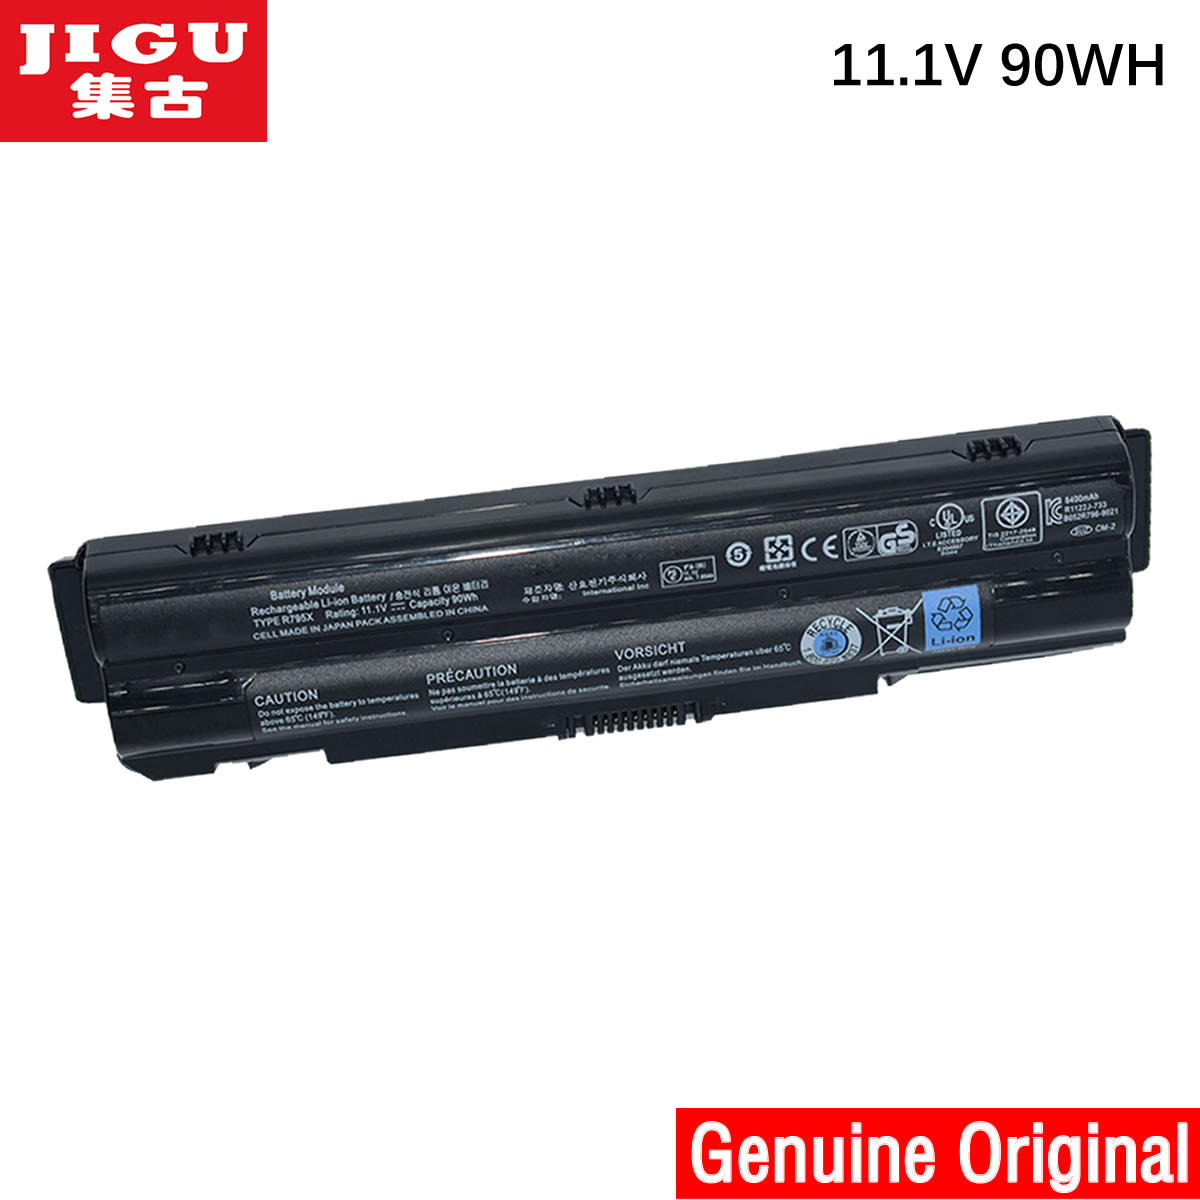 JIGU 312-1123 J70W7 R795X WHXY3 Original Laptop Battery For Dell XPS14 XPS15 L402x L501x L502x L701x L702x 11.1V 90WH 11 1v 90wh original battery for dell xps15 xps14 xps17 l702x l502x j70w7 r795x genuine xps14 xps15 high capacity battery 9 cell